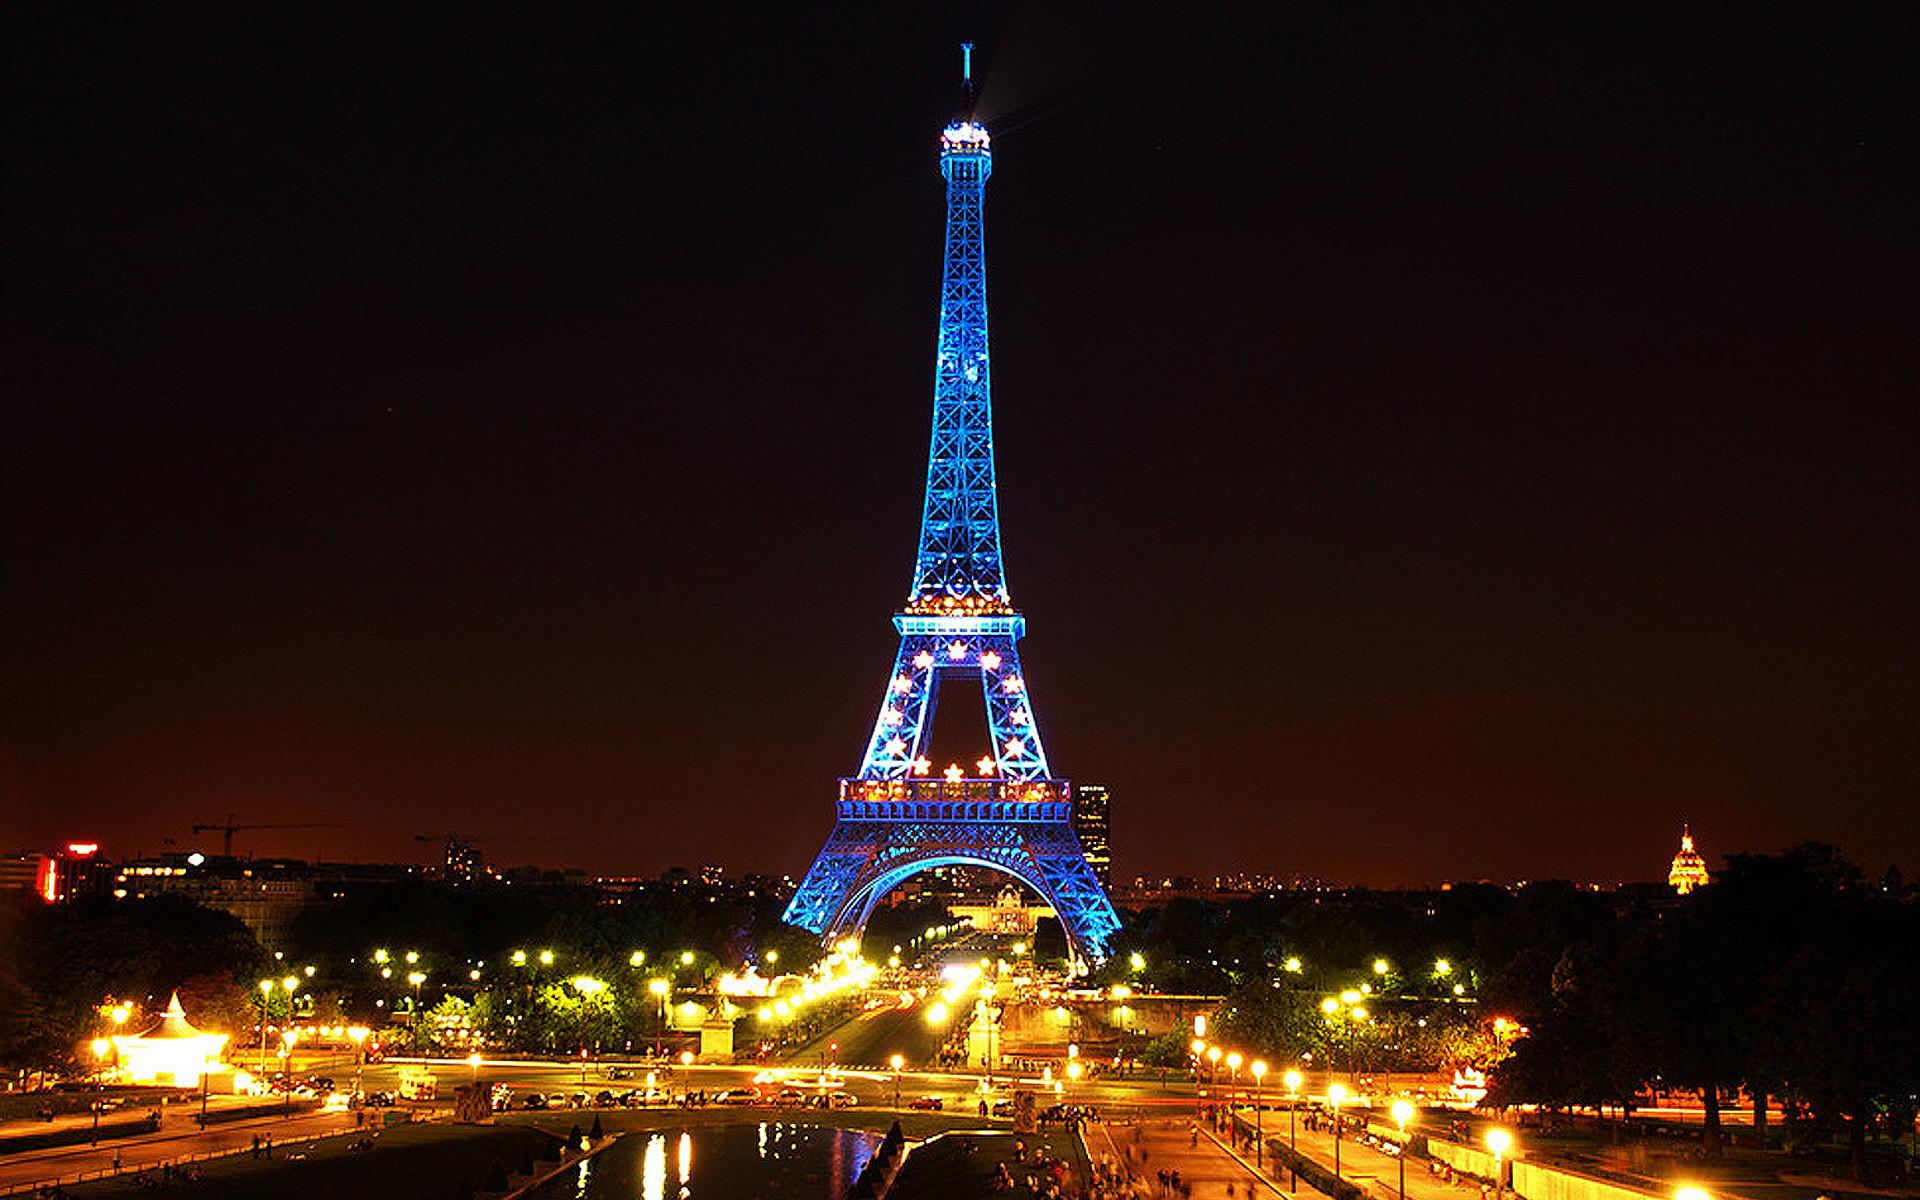 Hd wallpaper paris - Beautiful Paris City Night Wallpaper Hd 9 High Resolution Wallpaper